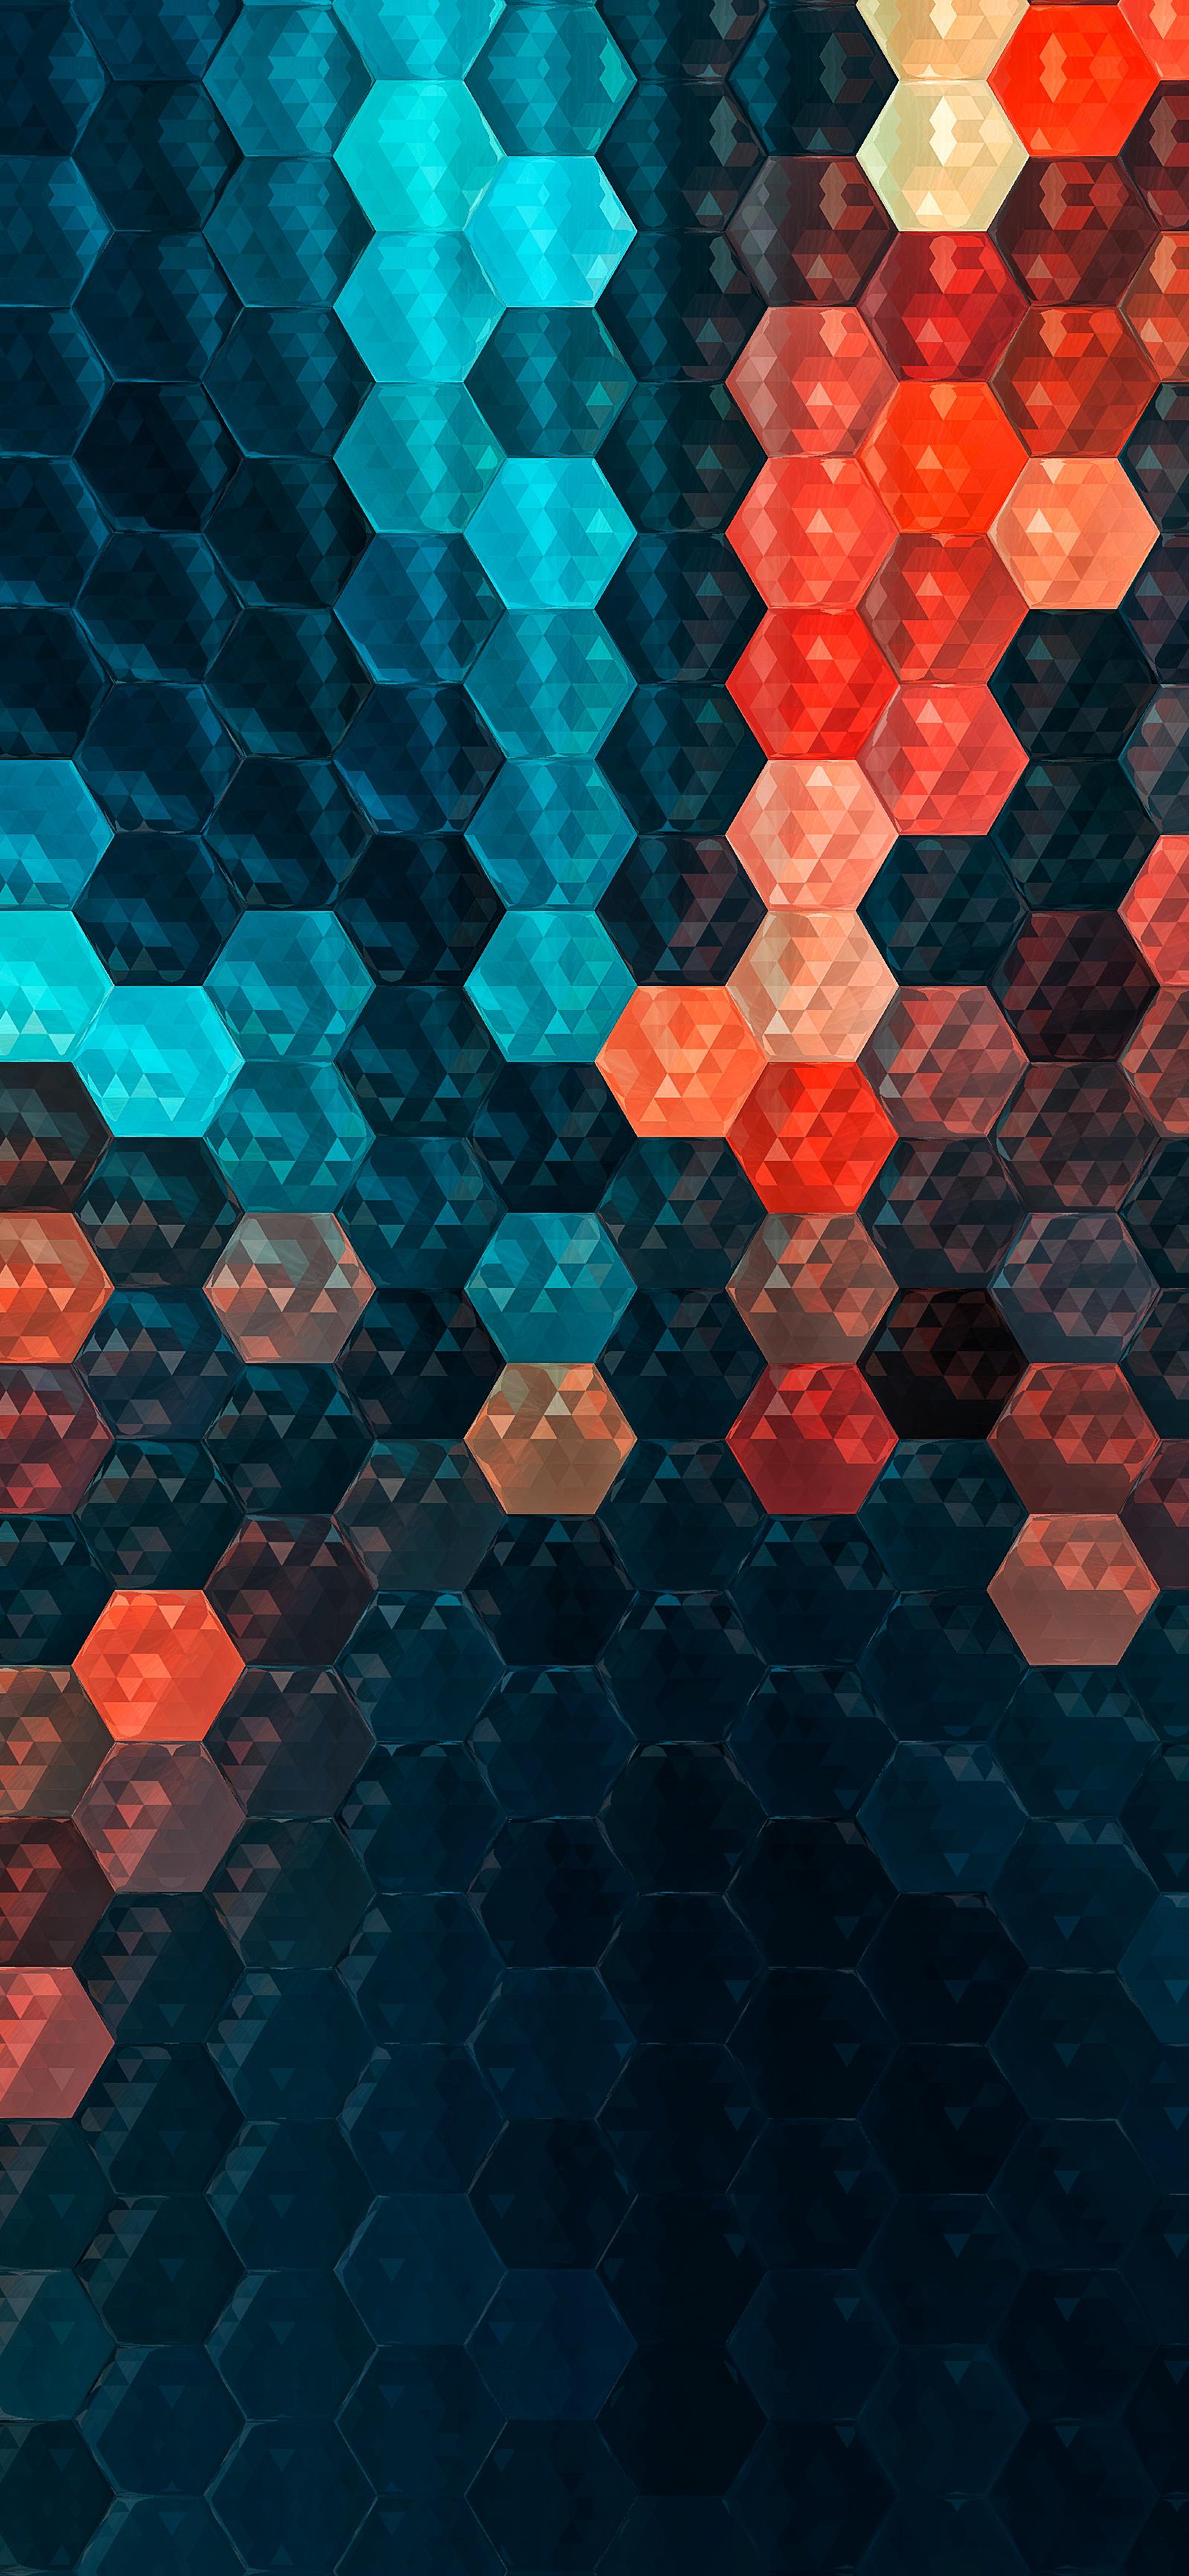 hexagon multi color wallpaper IPHONE X, XR, XS, XS MAX, 1PLUS 6T - V125 - JFL